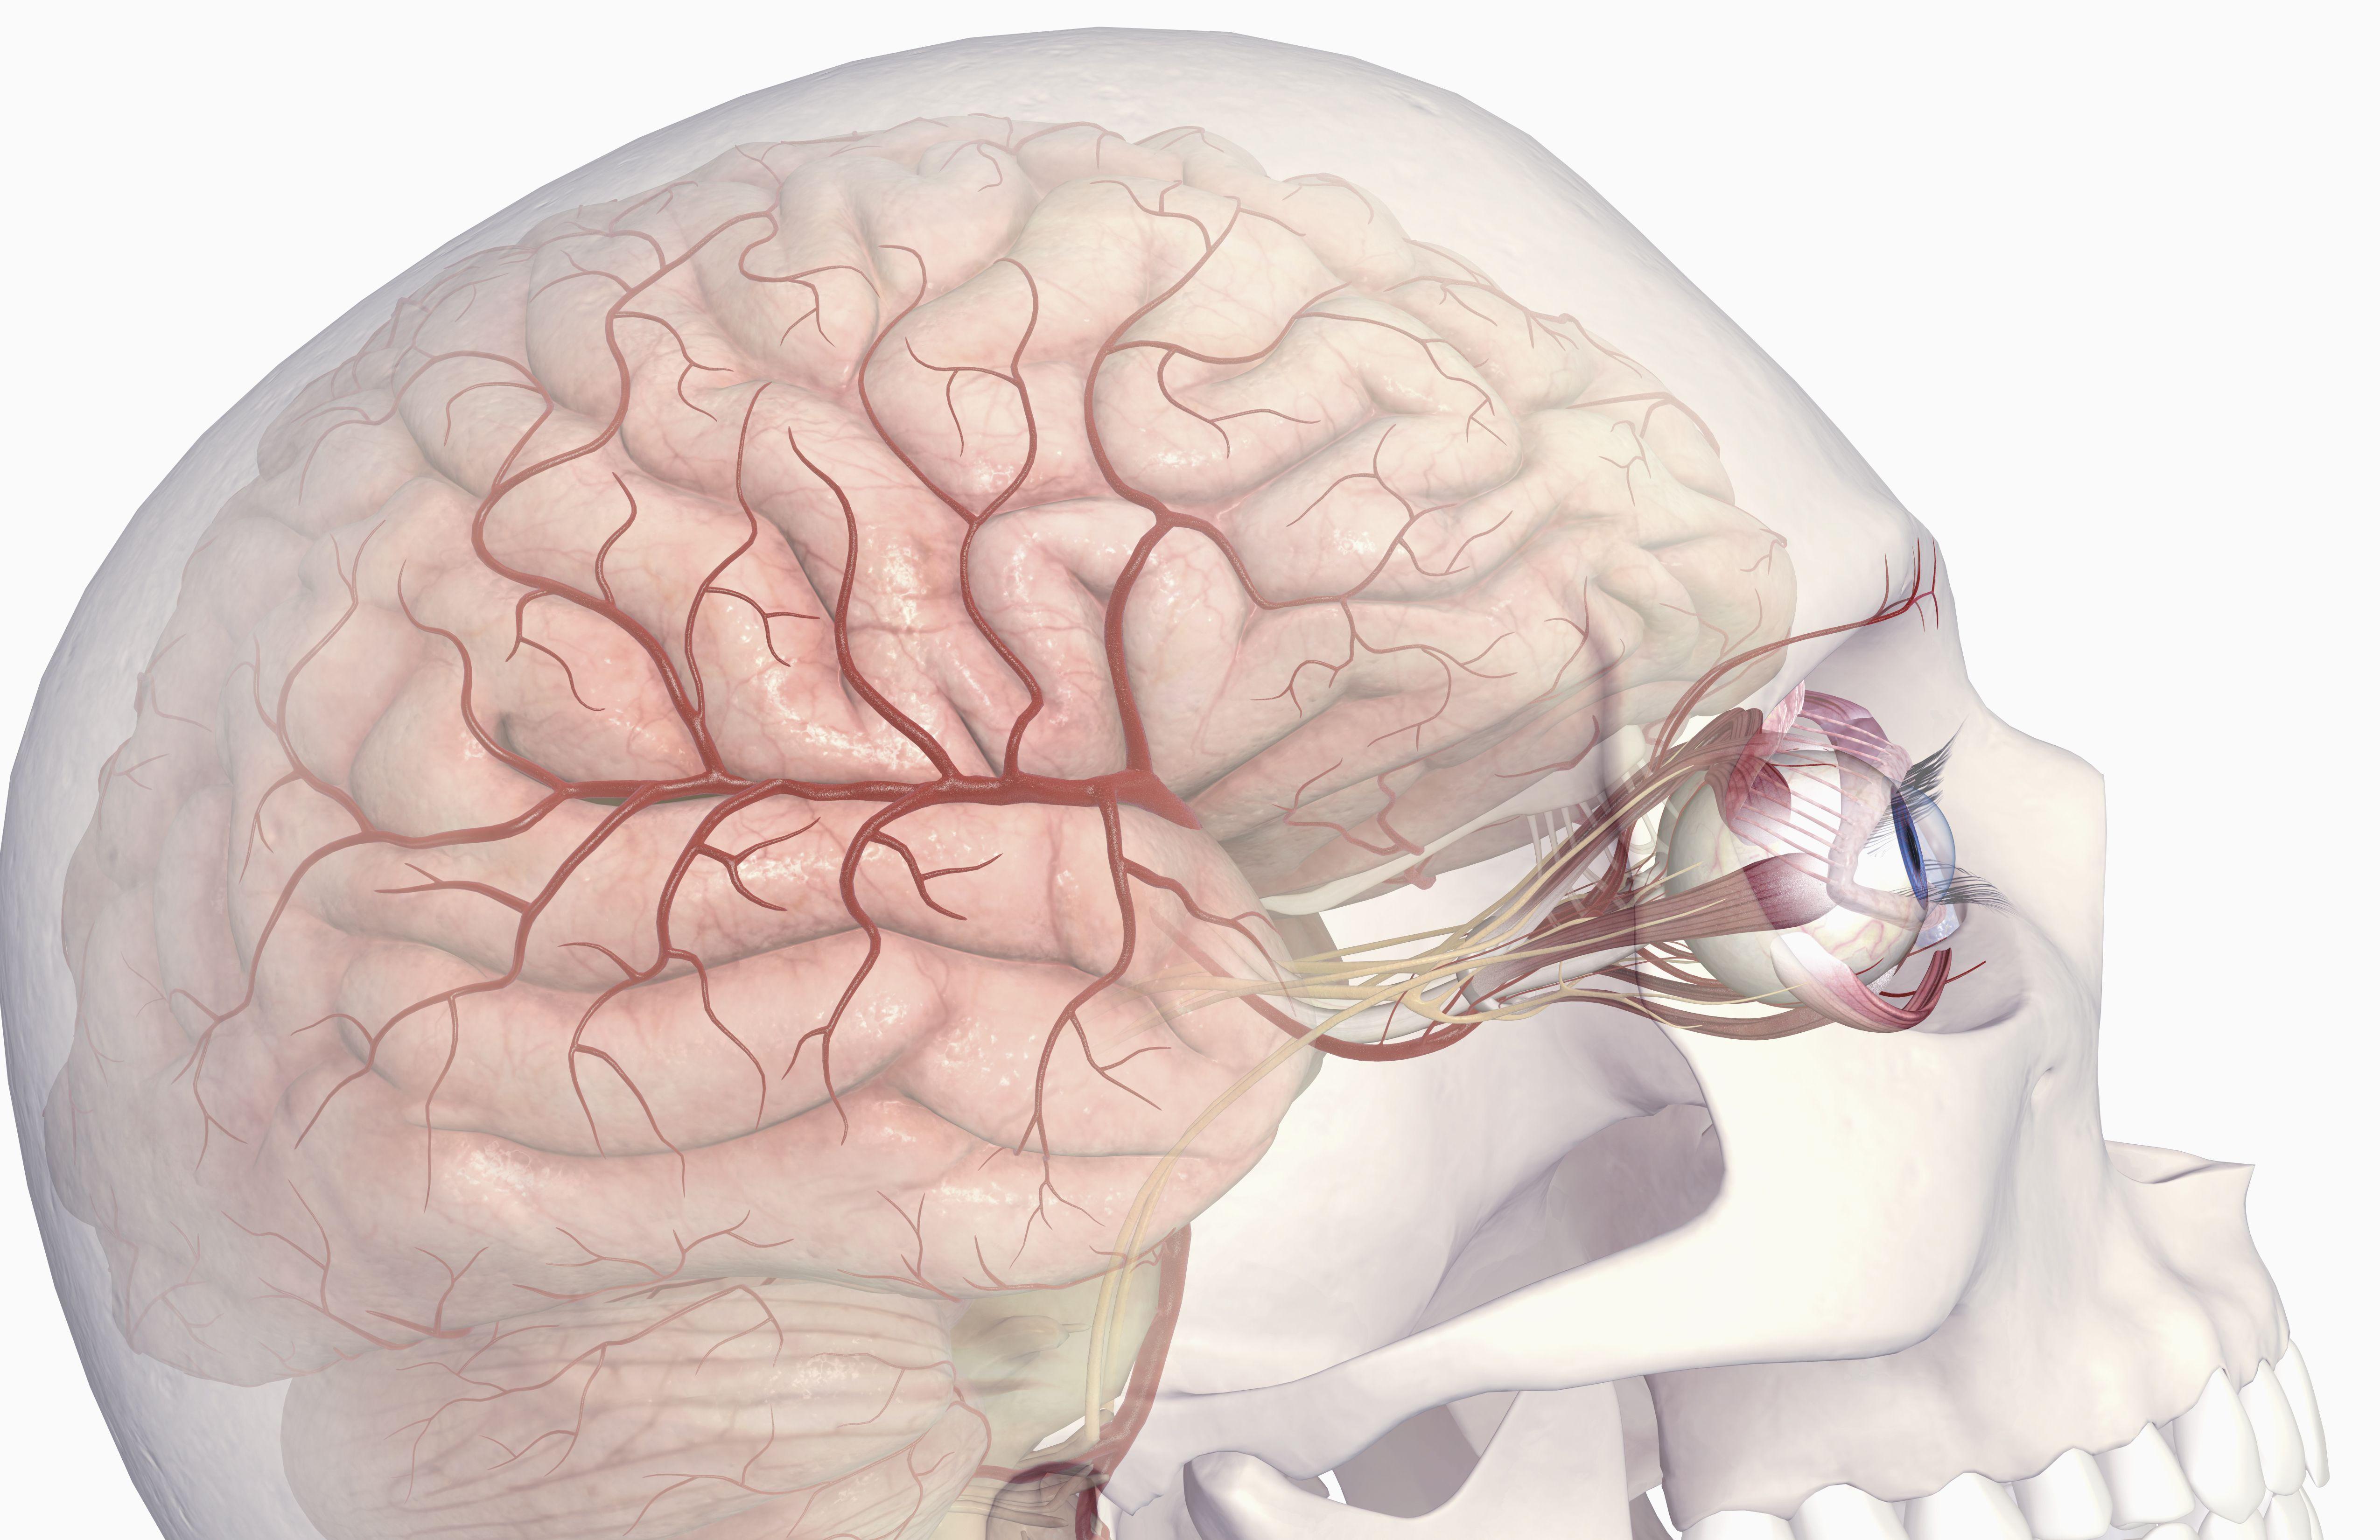 Cranial Nerve Damage From Head Trauma